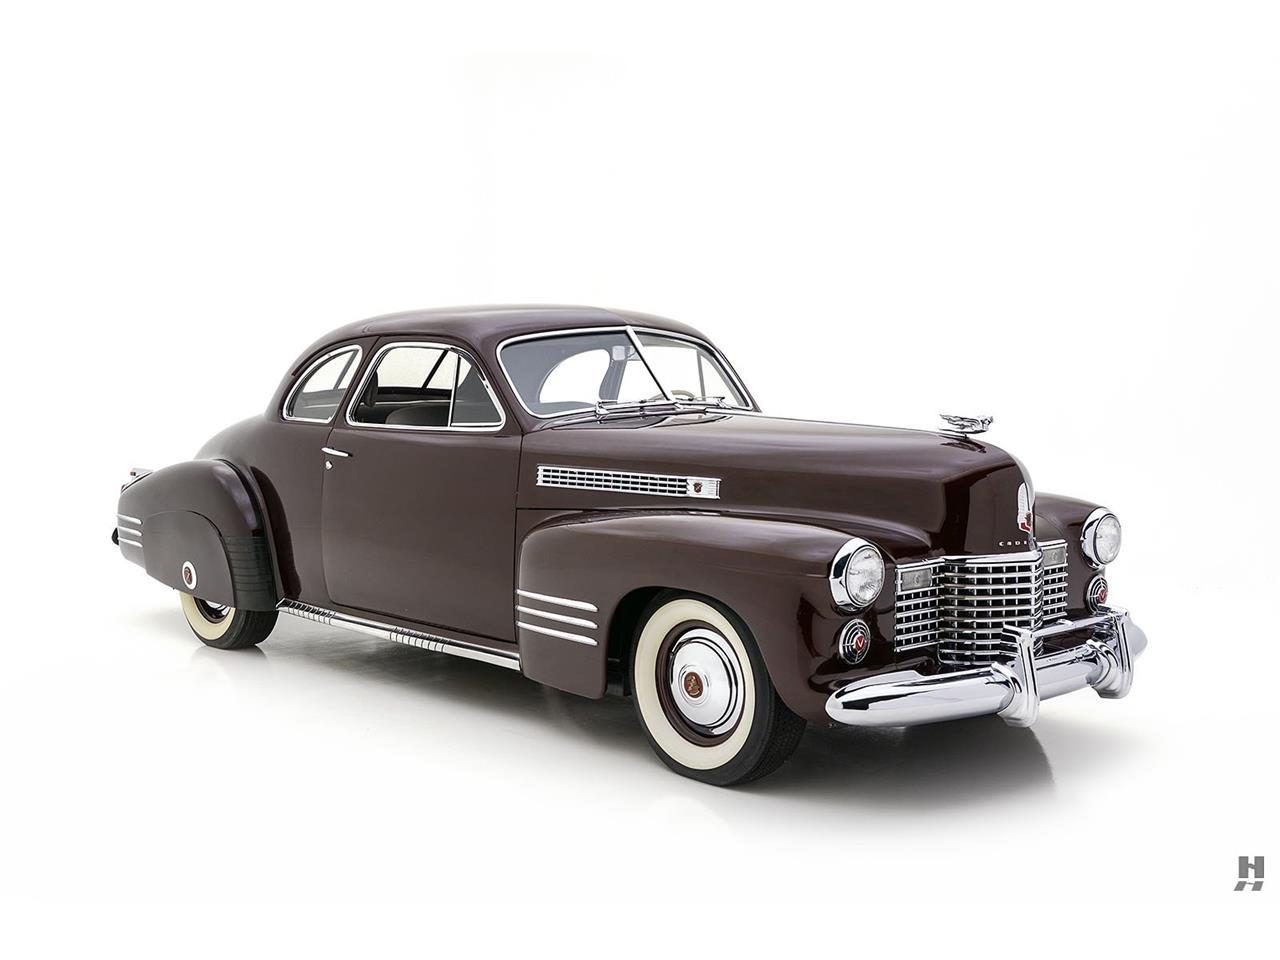 1941 Cadillac Series 62 (CC-1344514) for sale in Saint Louis, Missouri